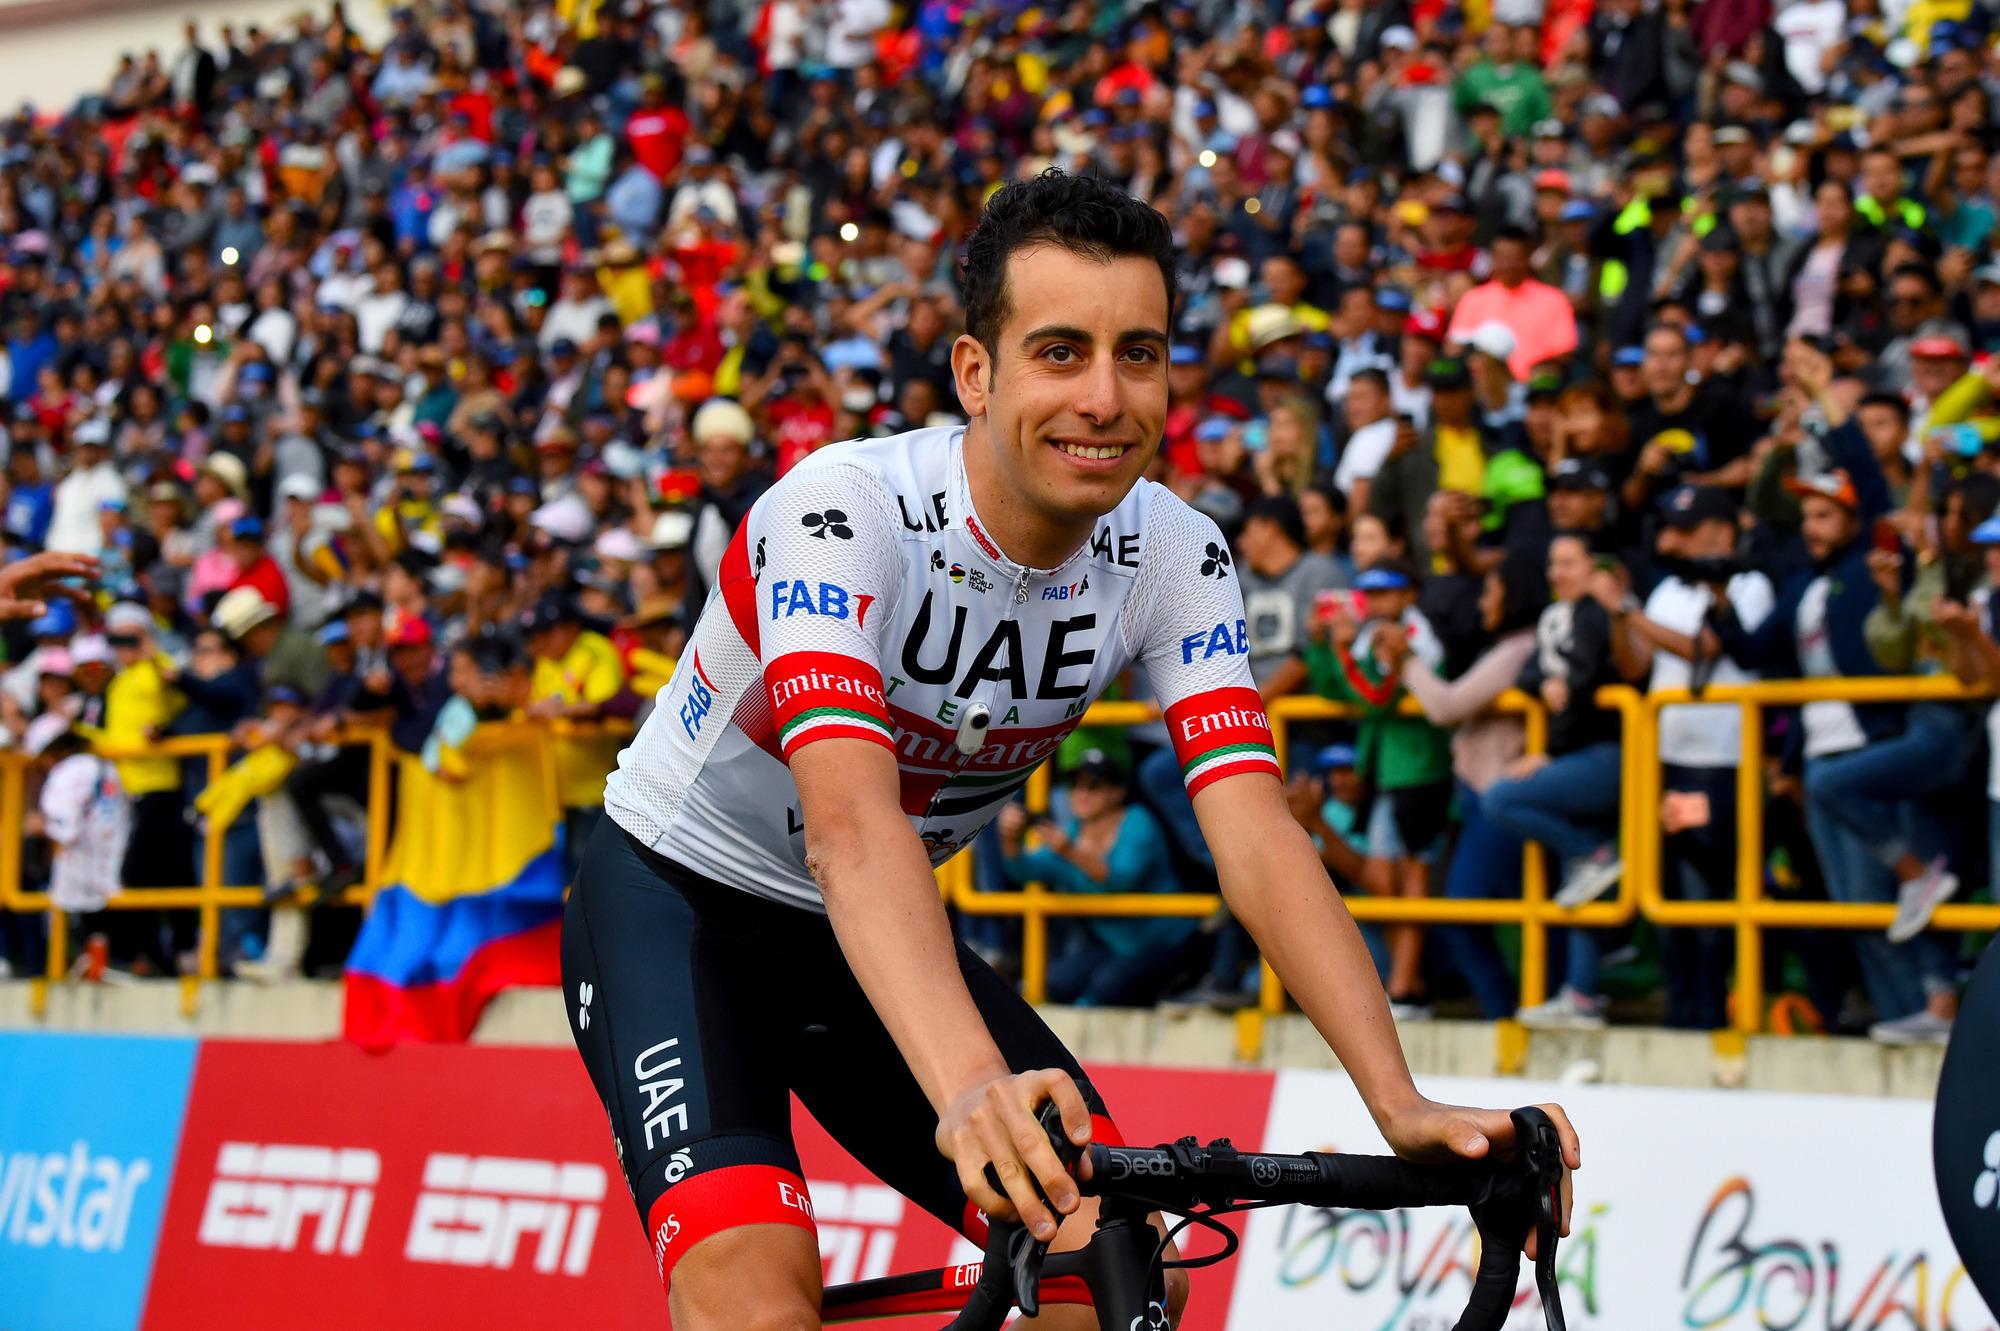 Tour Colombia 2020 3rd Edition Team Presentation Tunja 09022020 Fabio Aru ITA UAE Team Emirates photo Dario BelingheriBettiniPhoto2020